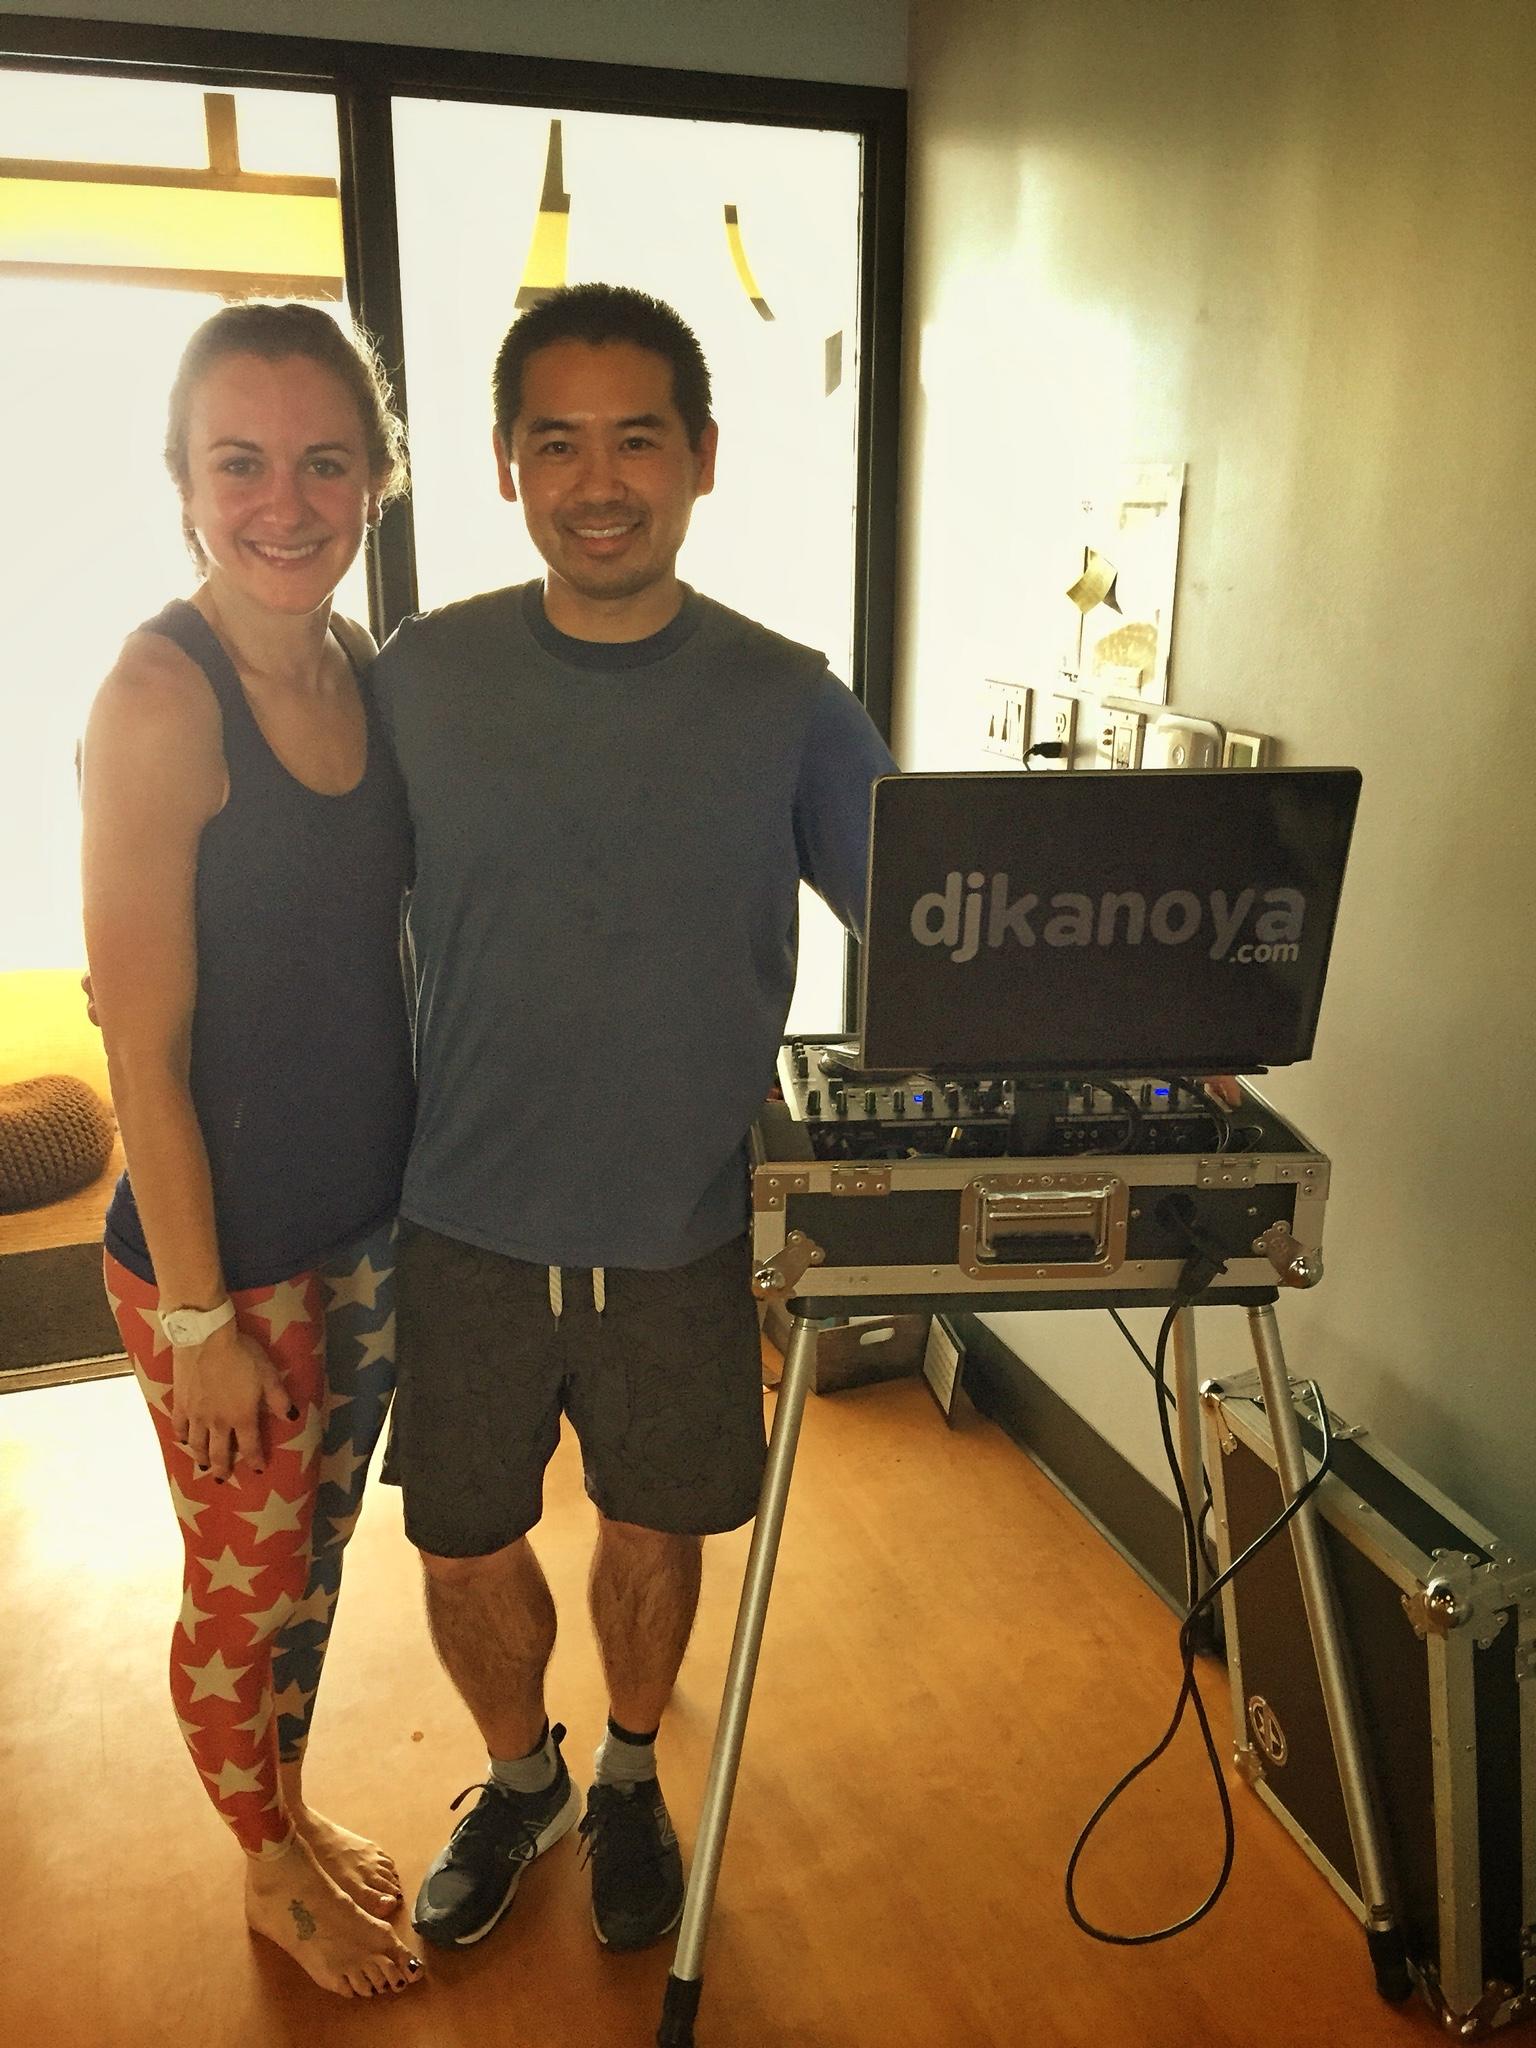 San Diego yoga DJ, Justin Kanoya, with Corepower Yoga teacher, Amanda Mays after a live DJ'd yoga workout.